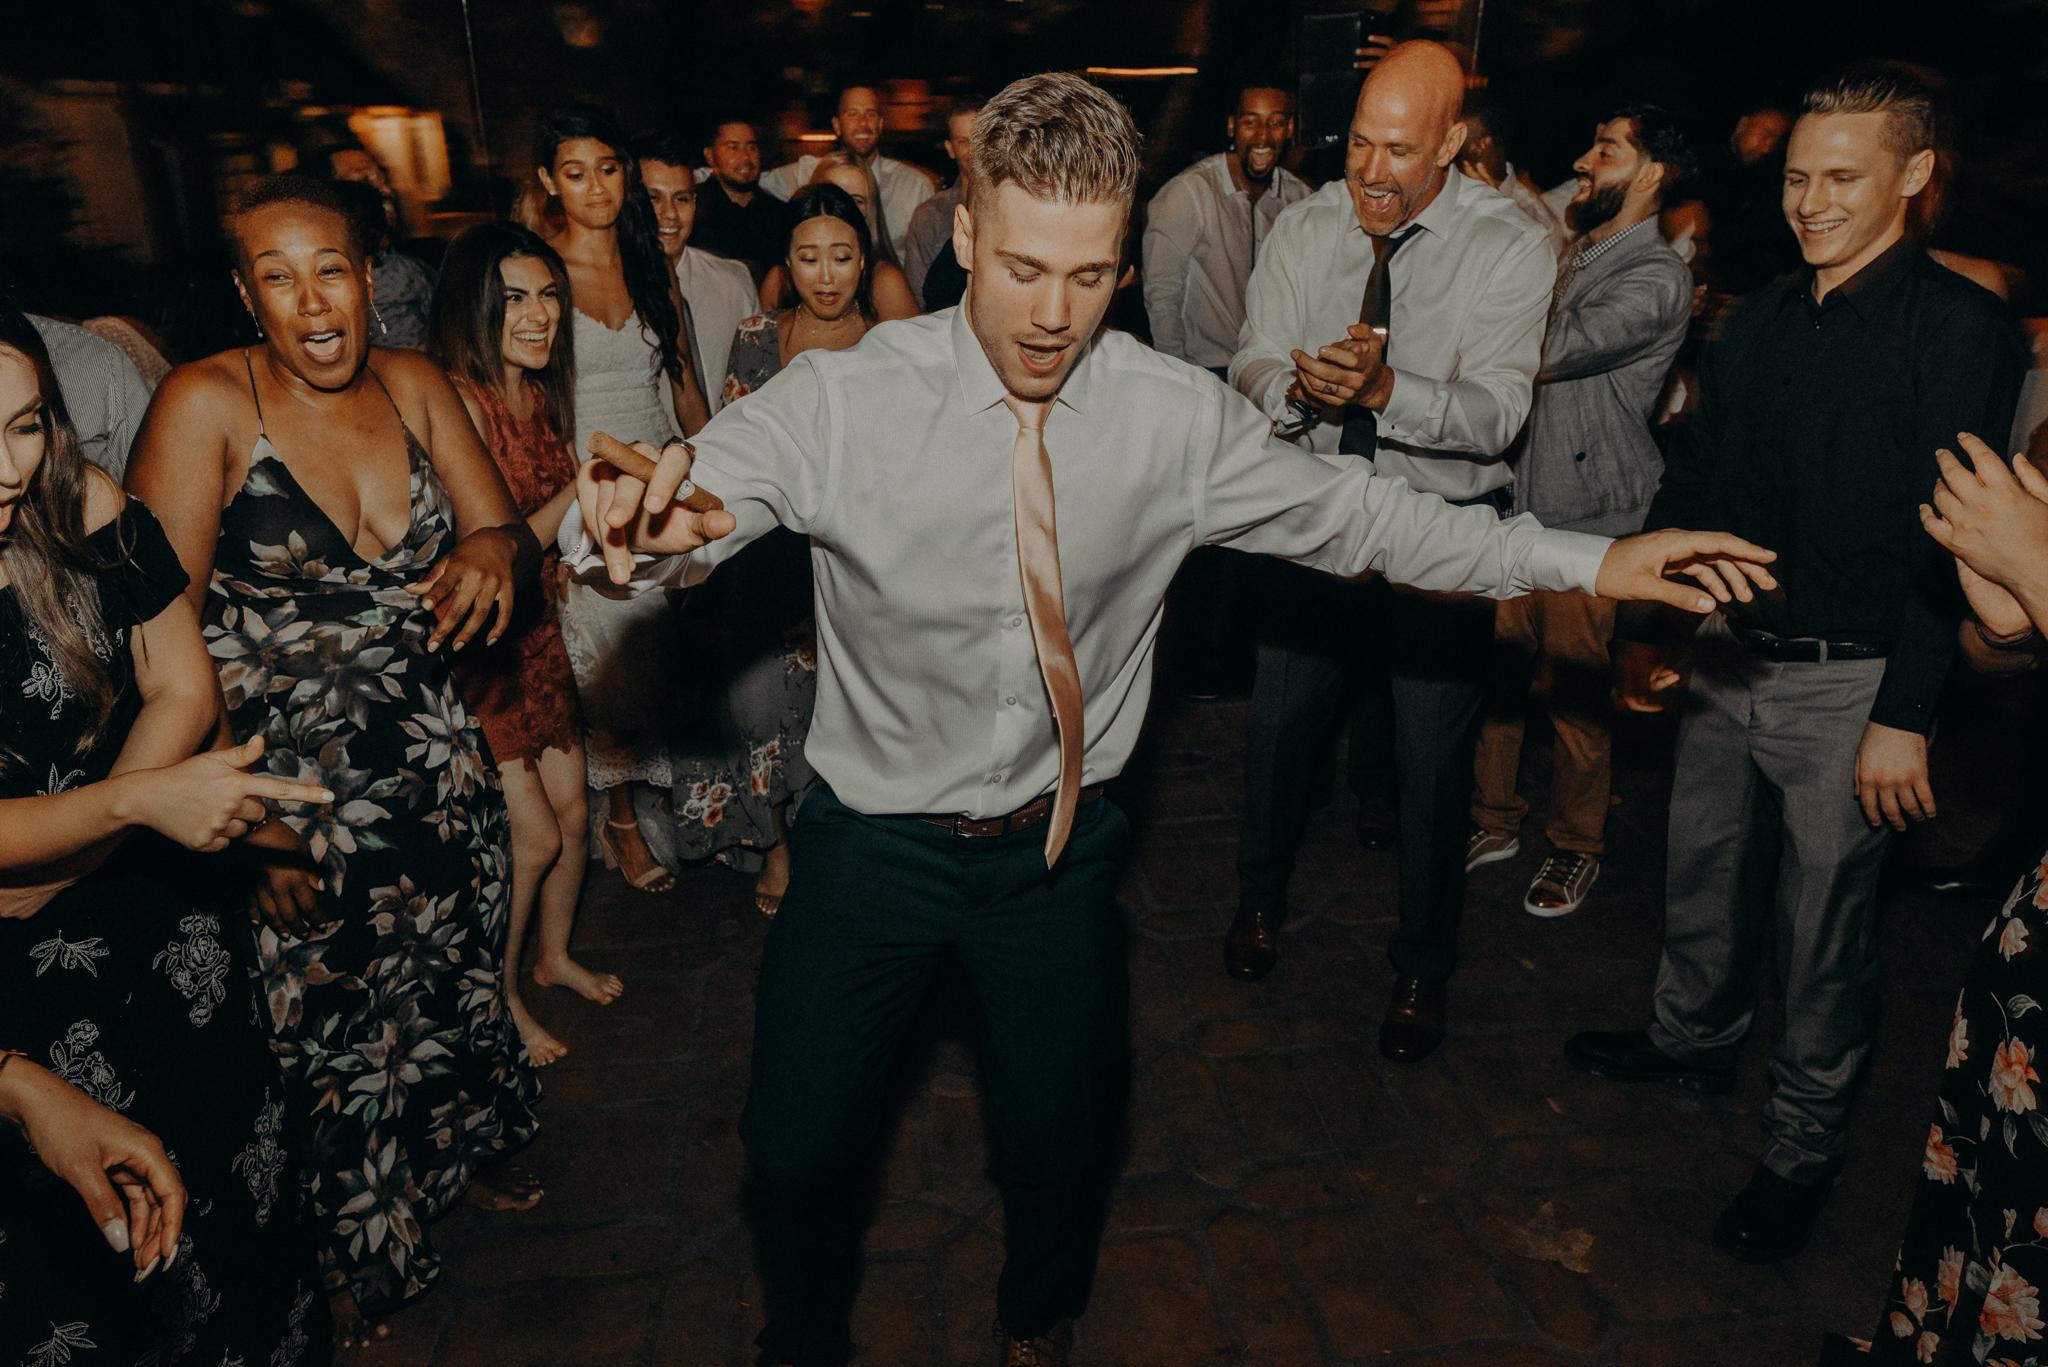 Isaiah + Taylor Photography - Rancho Las Lomas Wedding, Los Angeles Wedding Photographer-159.jpg